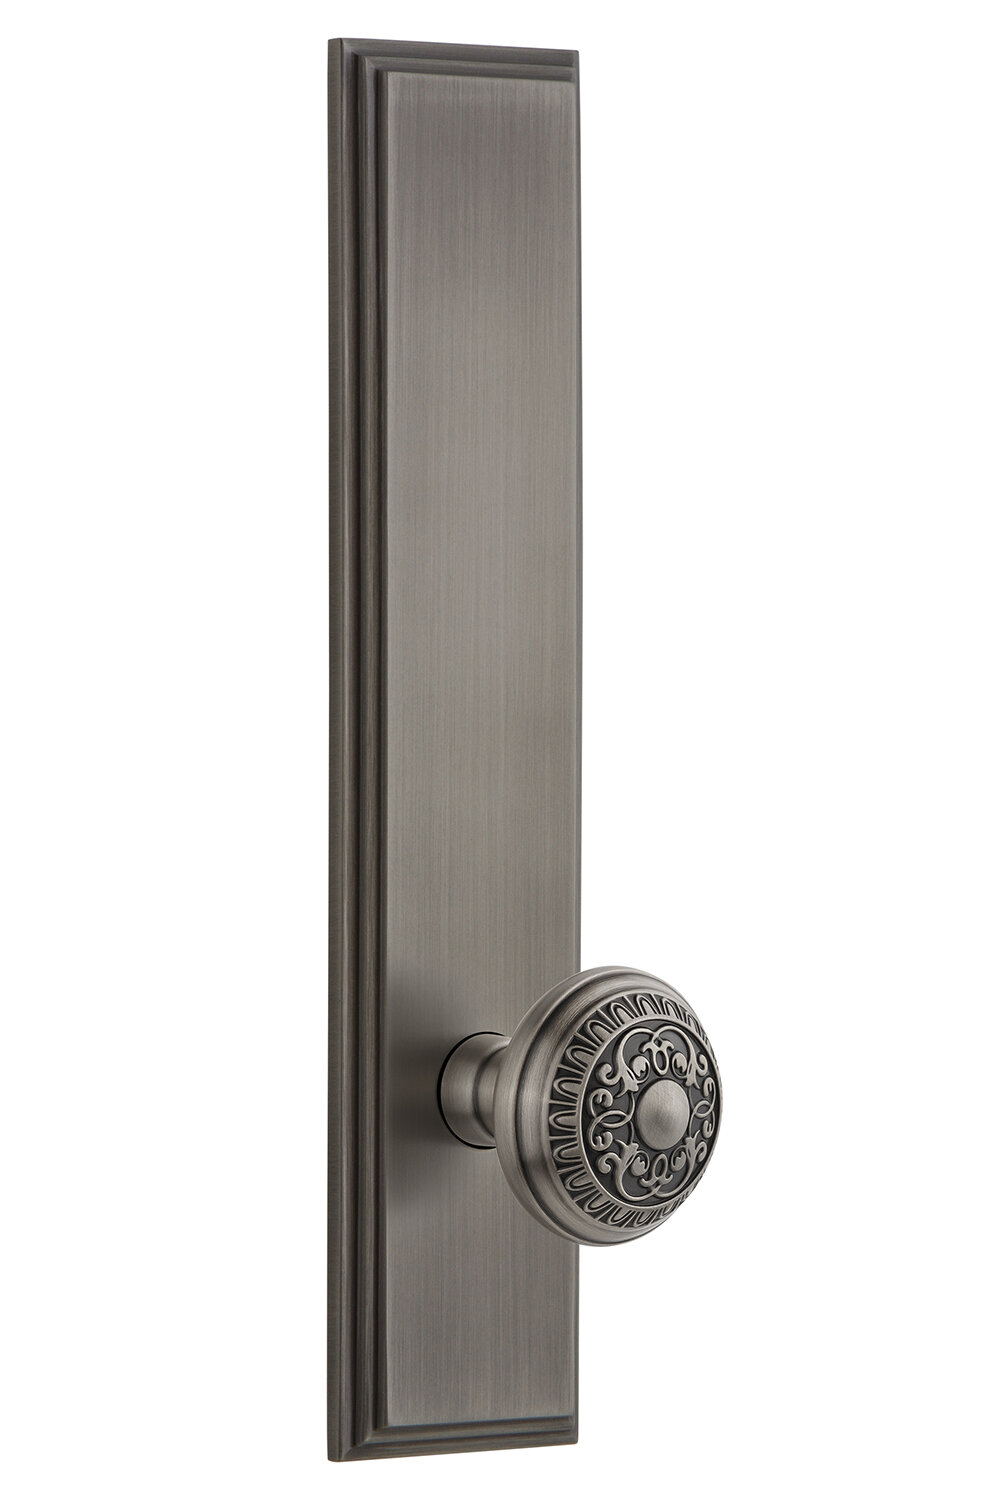 Grandeur Windsor Privacy Door Knob With Carre Plate Wayfair